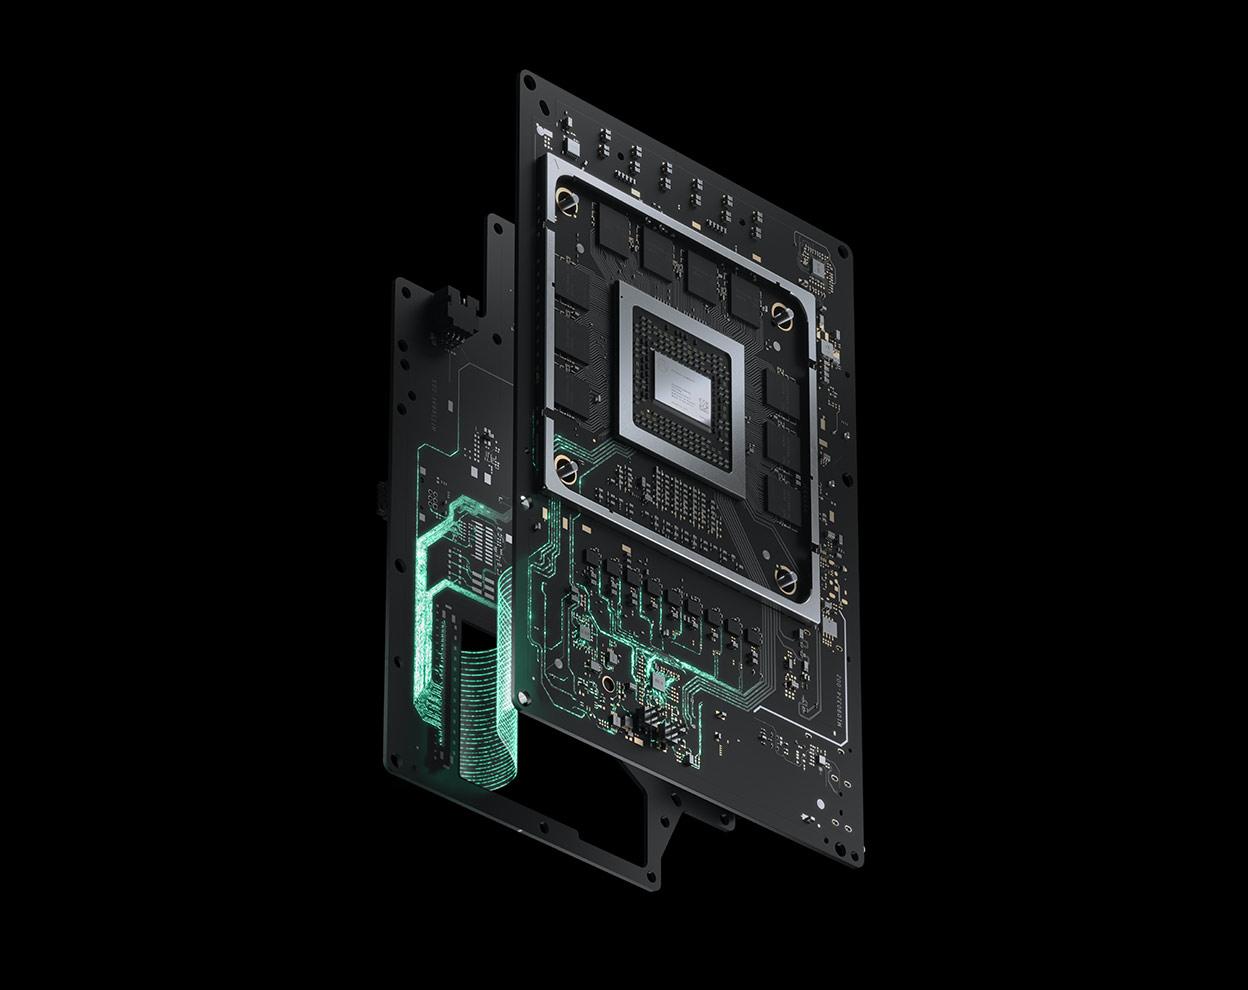 Tj0Efod - PS5の厚みがPS4Proの2倍になるというリーク